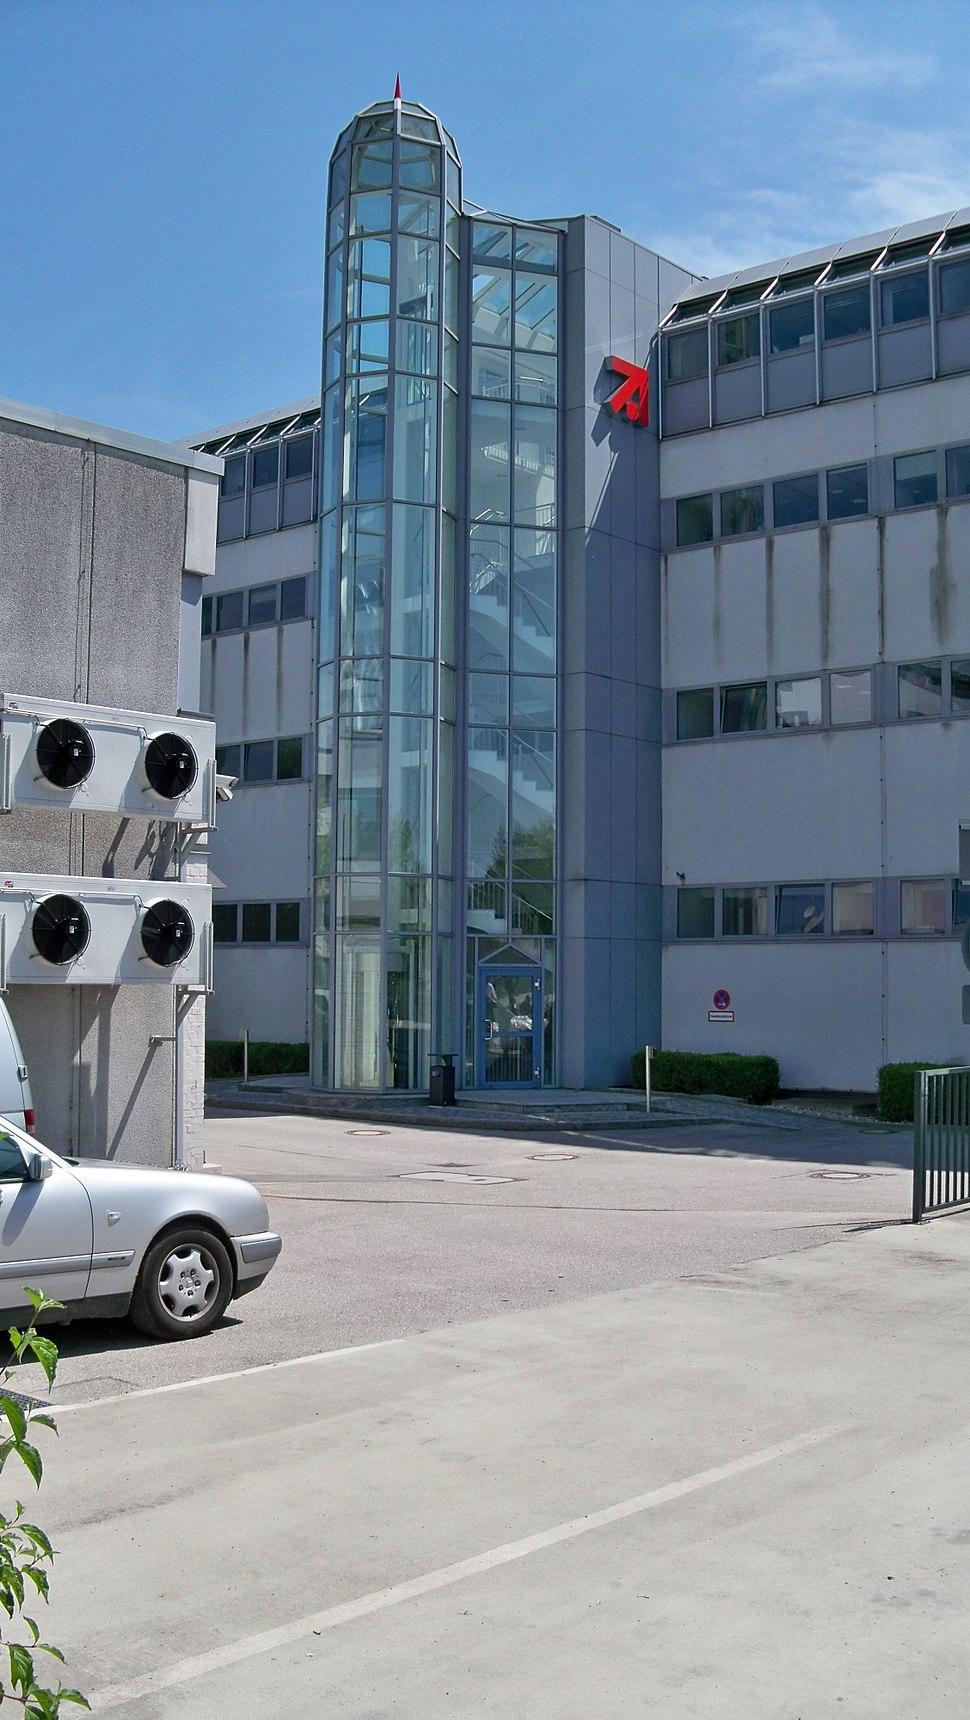 Detail ProSiebenSat.1 Media Unterf%C3%B6hring DE 2010-06-09